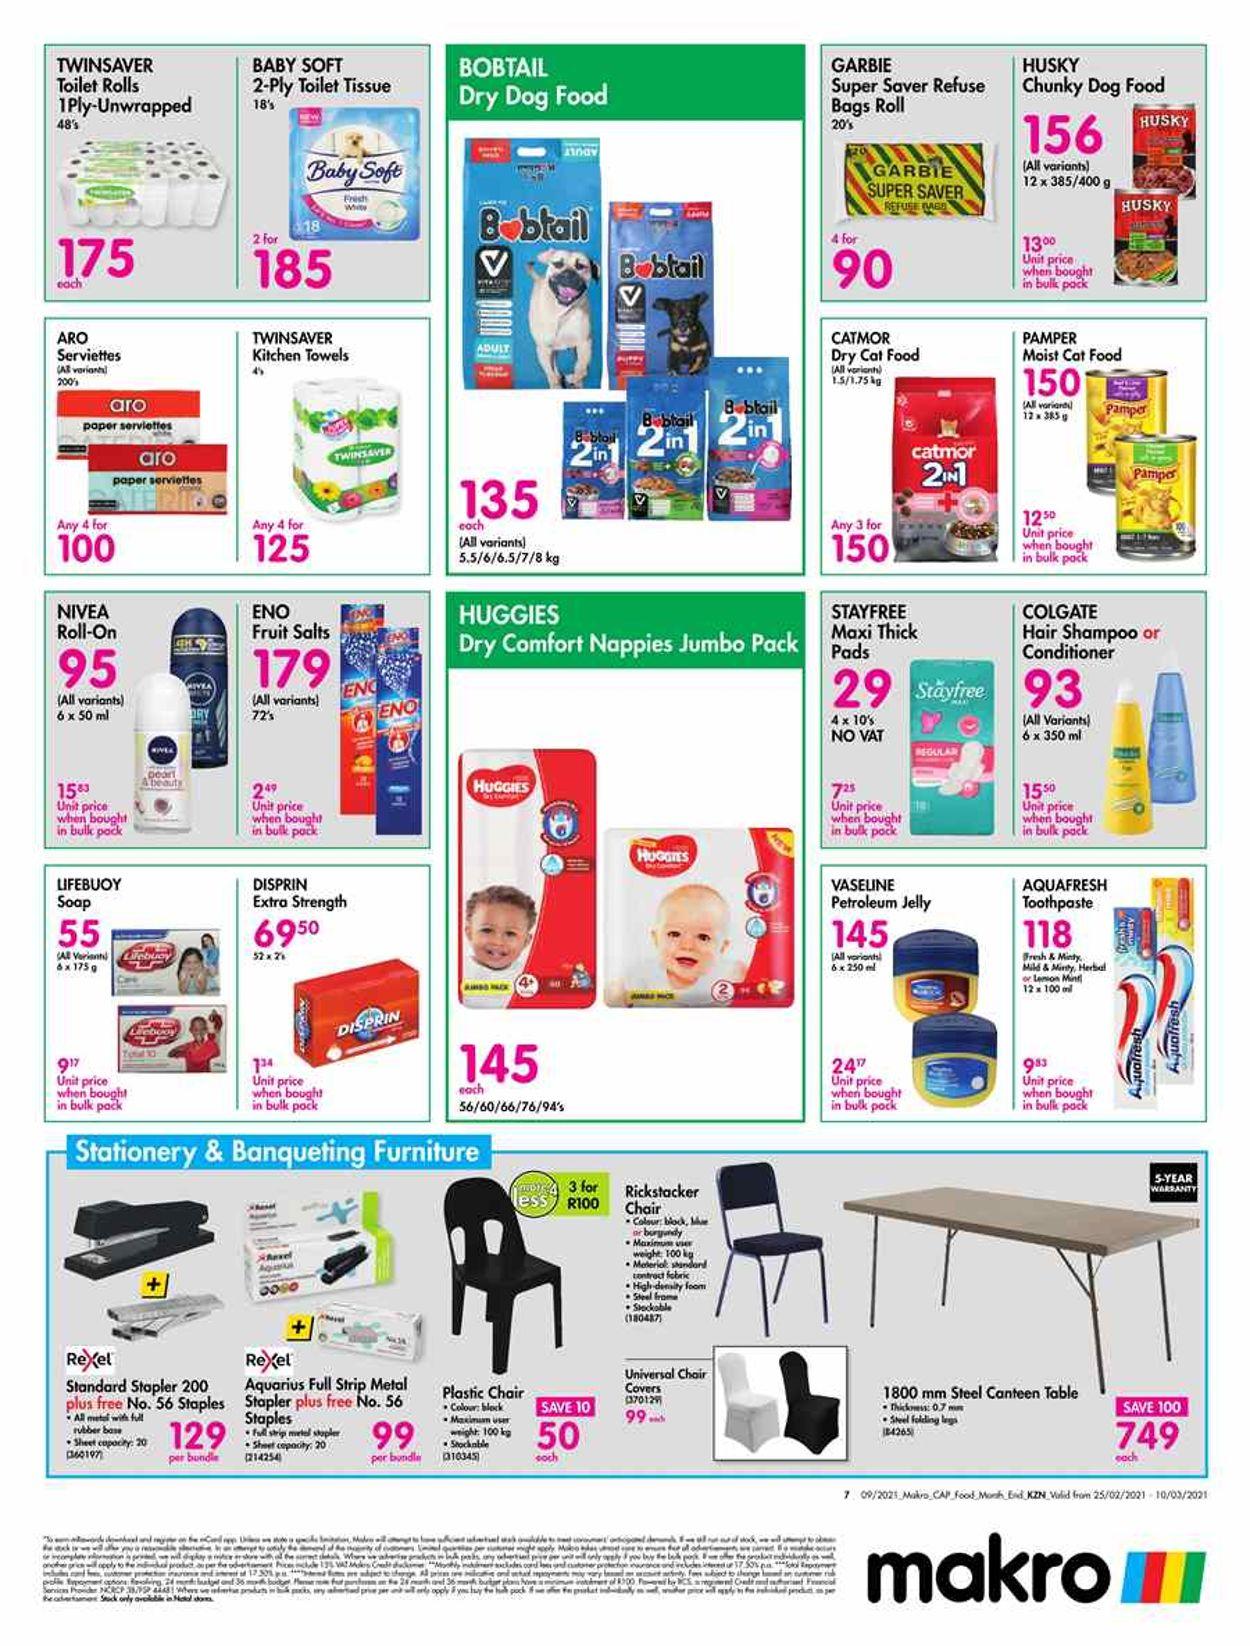 Makro Catalogue - 2021/03/25-2021/04/07 (Page 7)